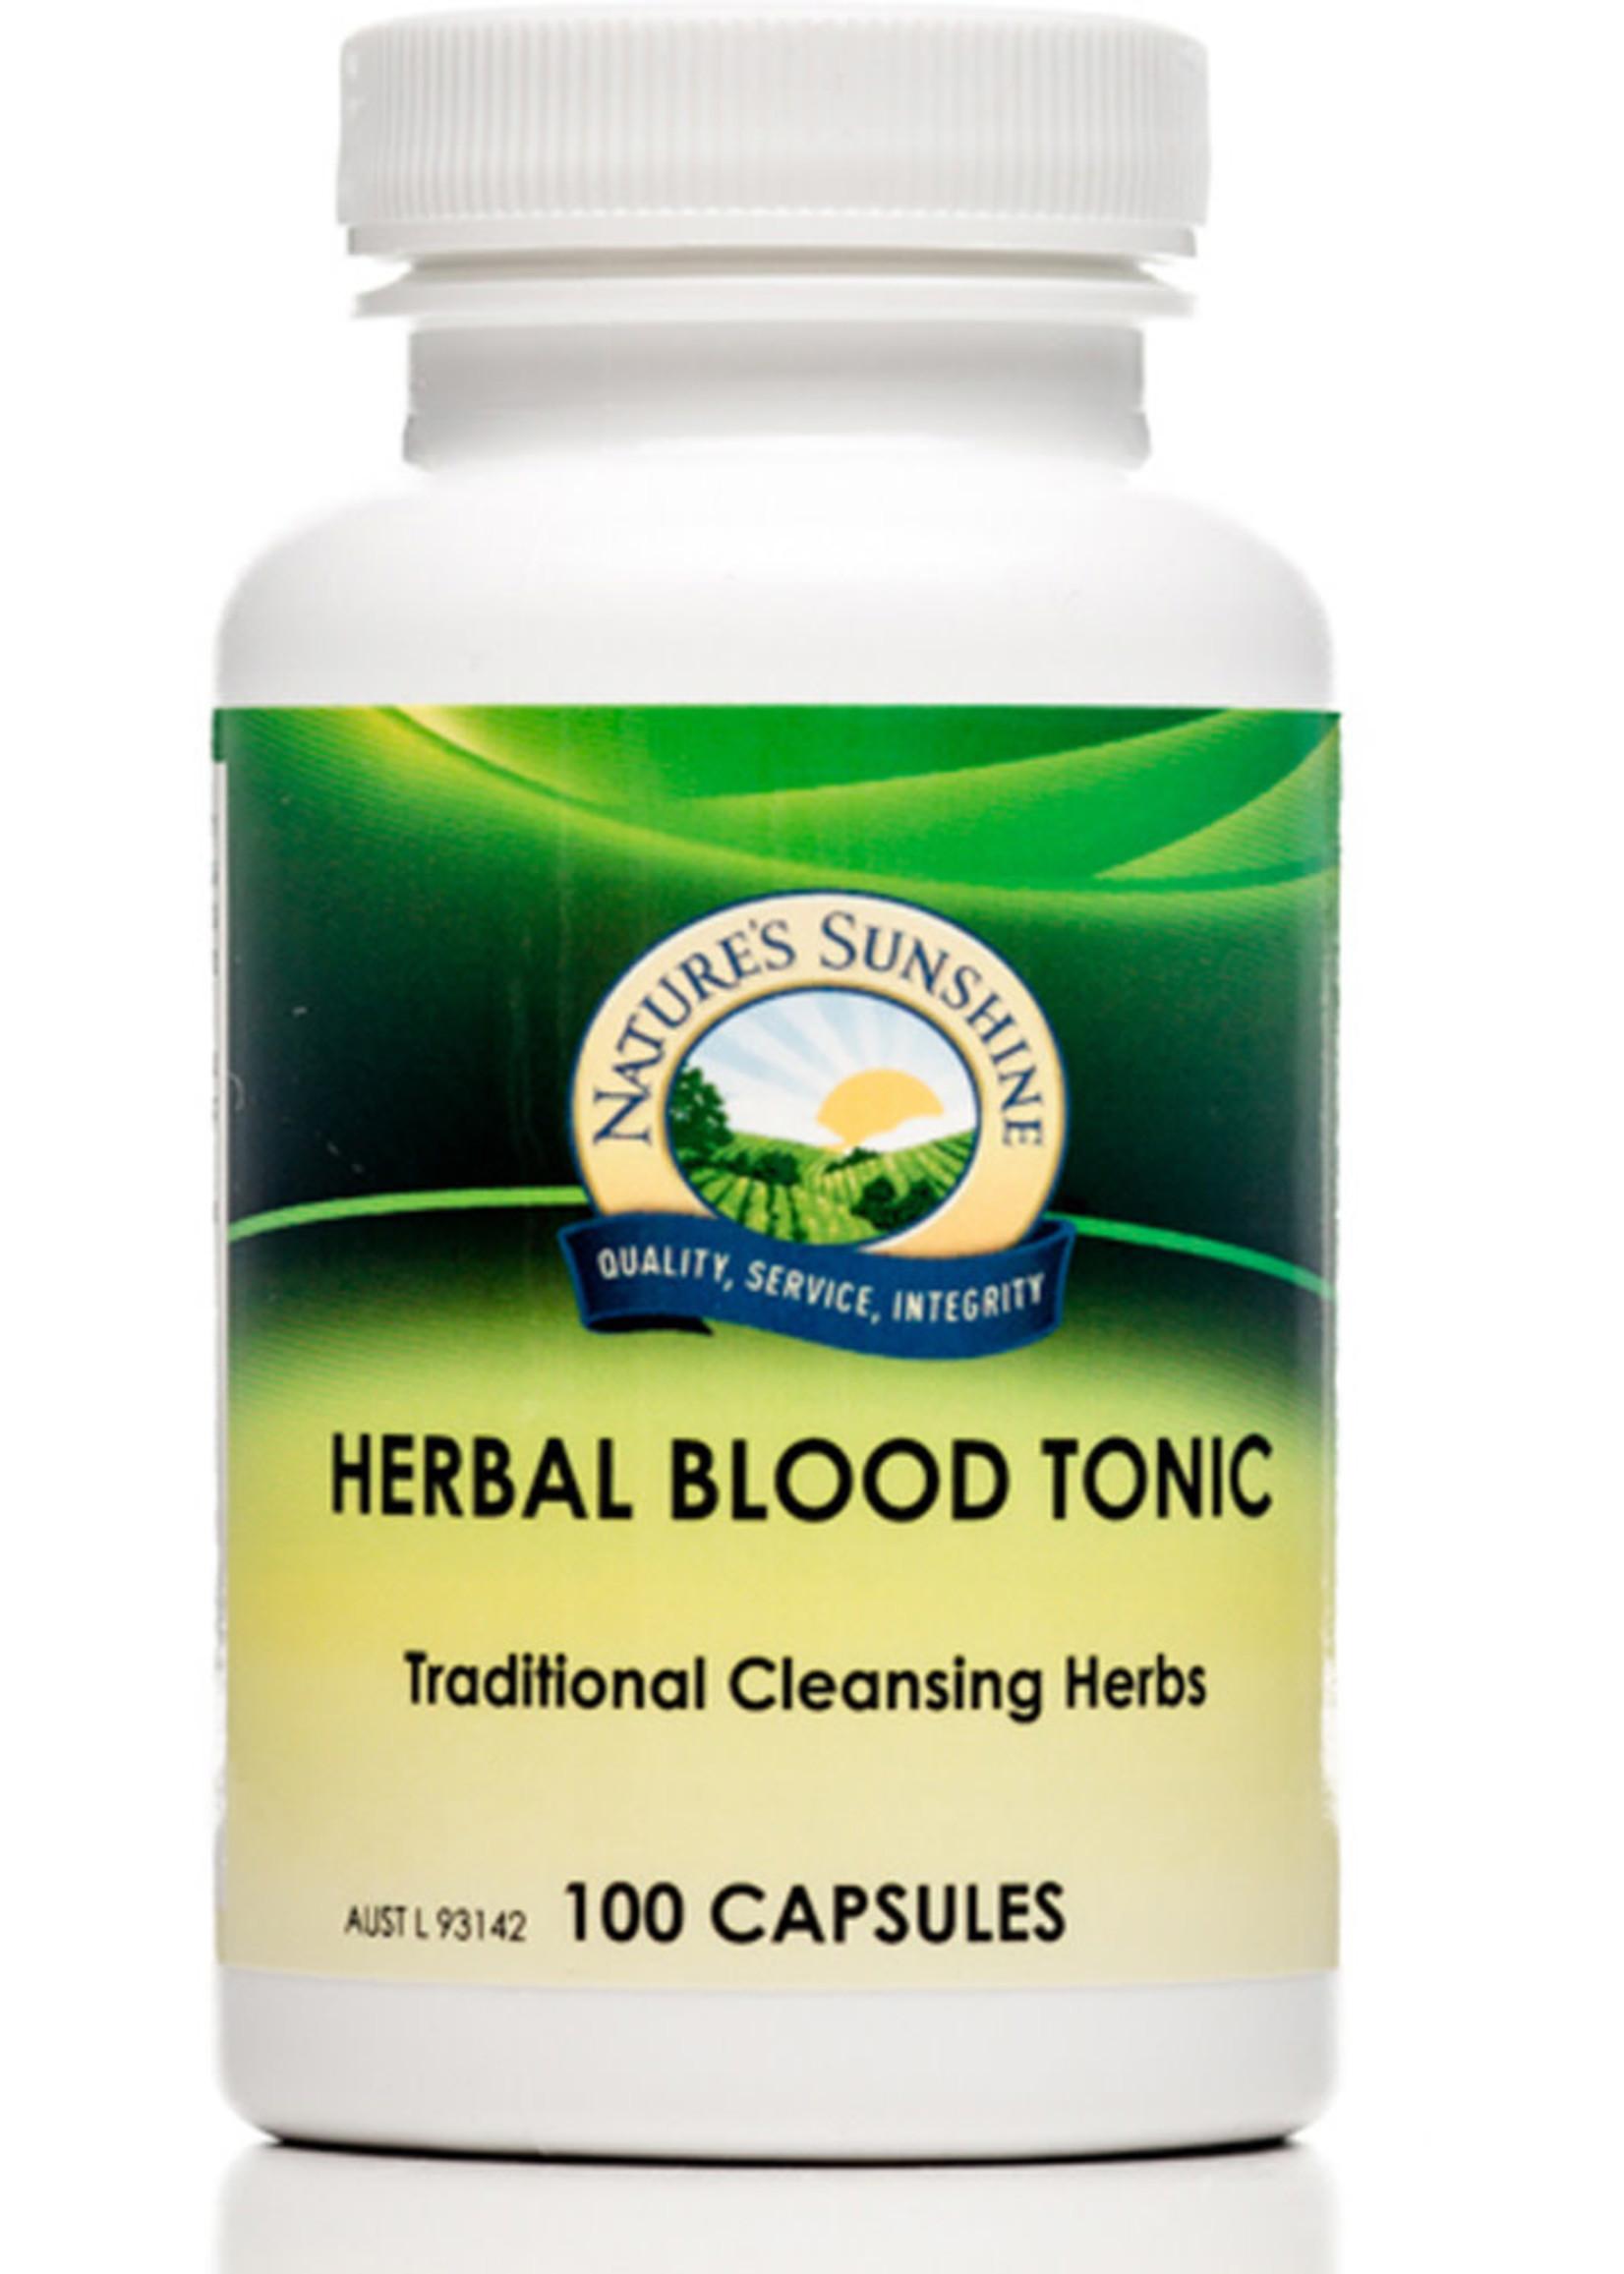 Nature's Sunshine Nature's Sunshine Herbal Blood Tonic 100 caps